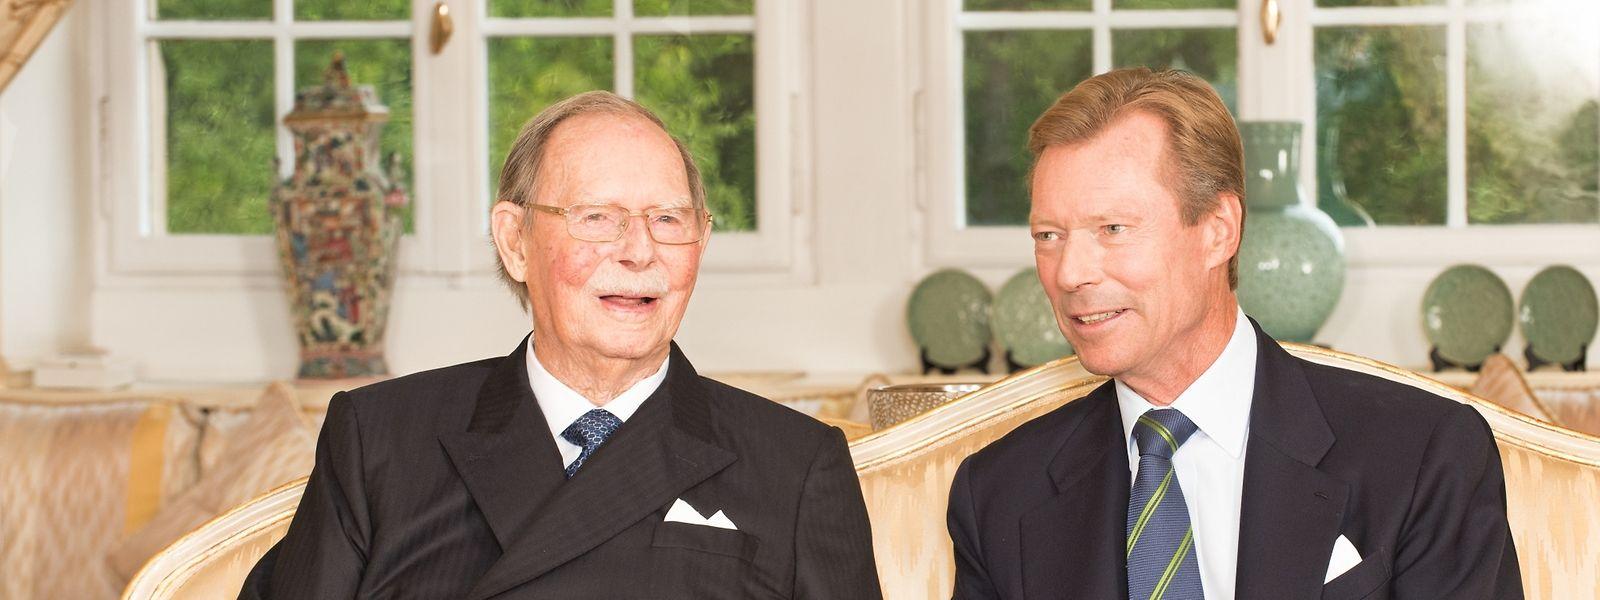 Grand-Duc Jean mit seinem Sohn Henri